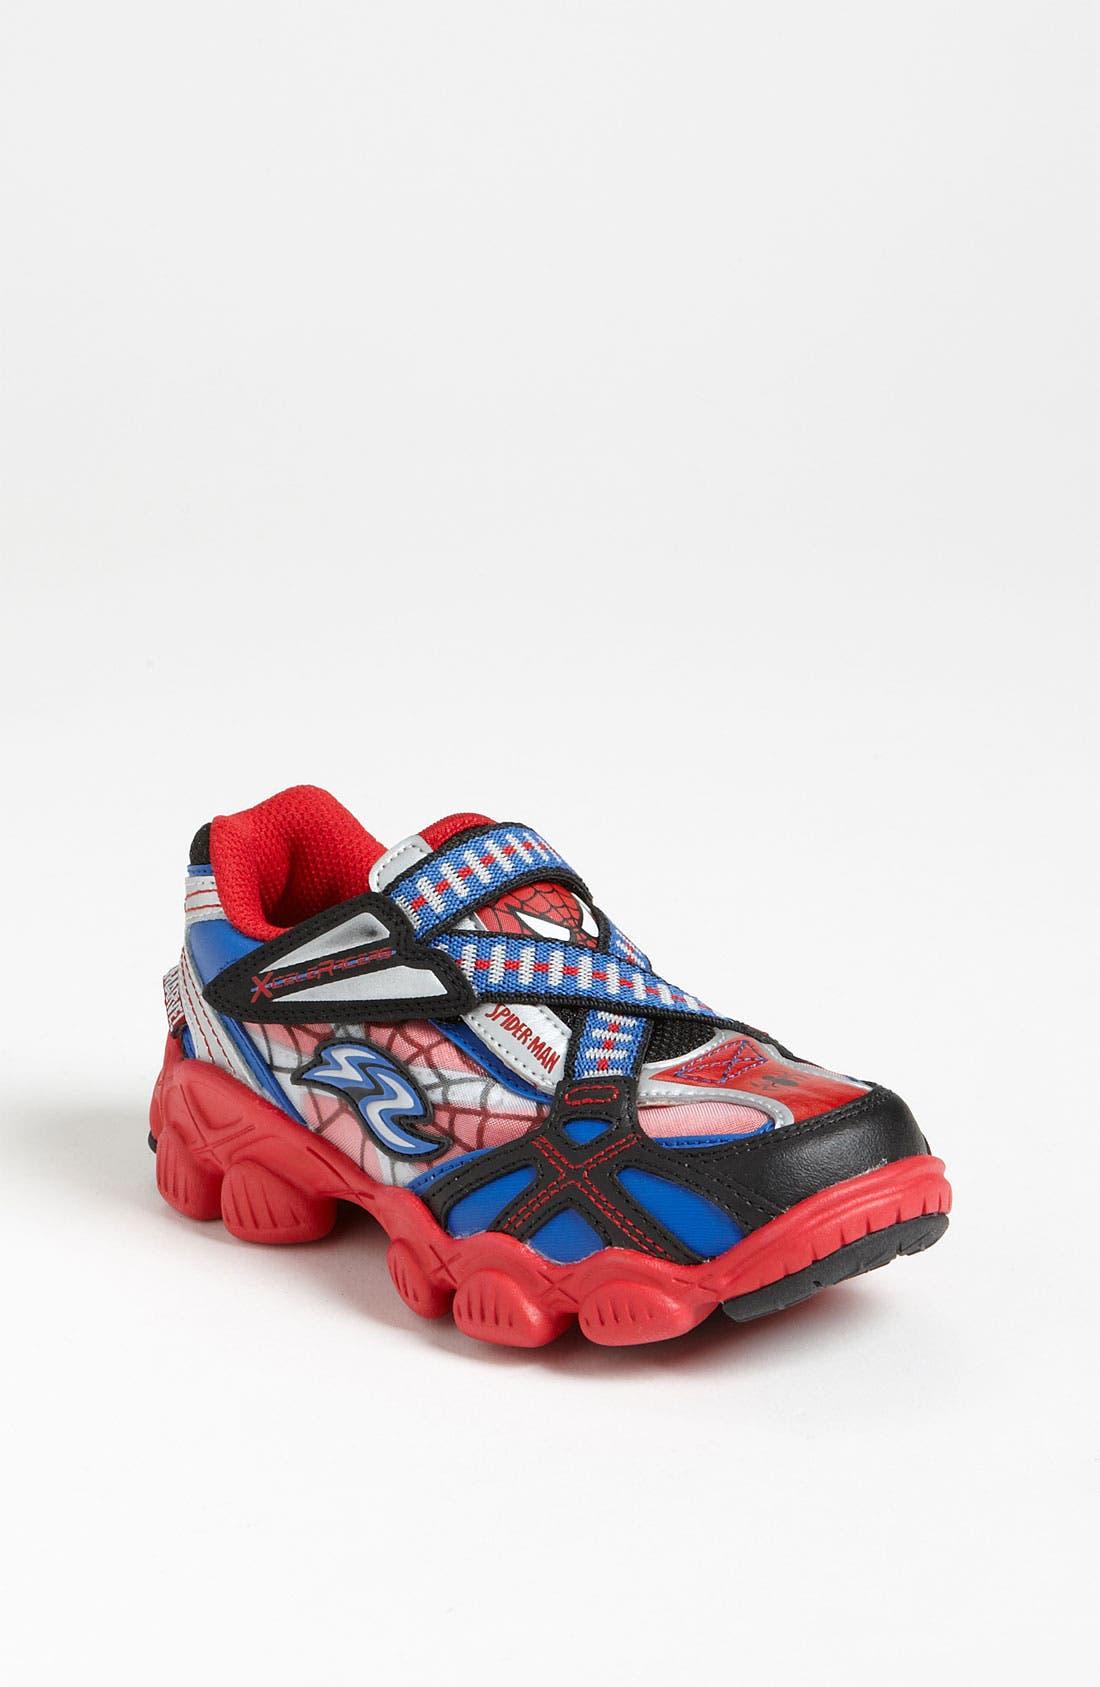 Main Image - Stride Rite 'X-Celeracers Spider-Man®' Sneaker (Toddler & Little Kid)